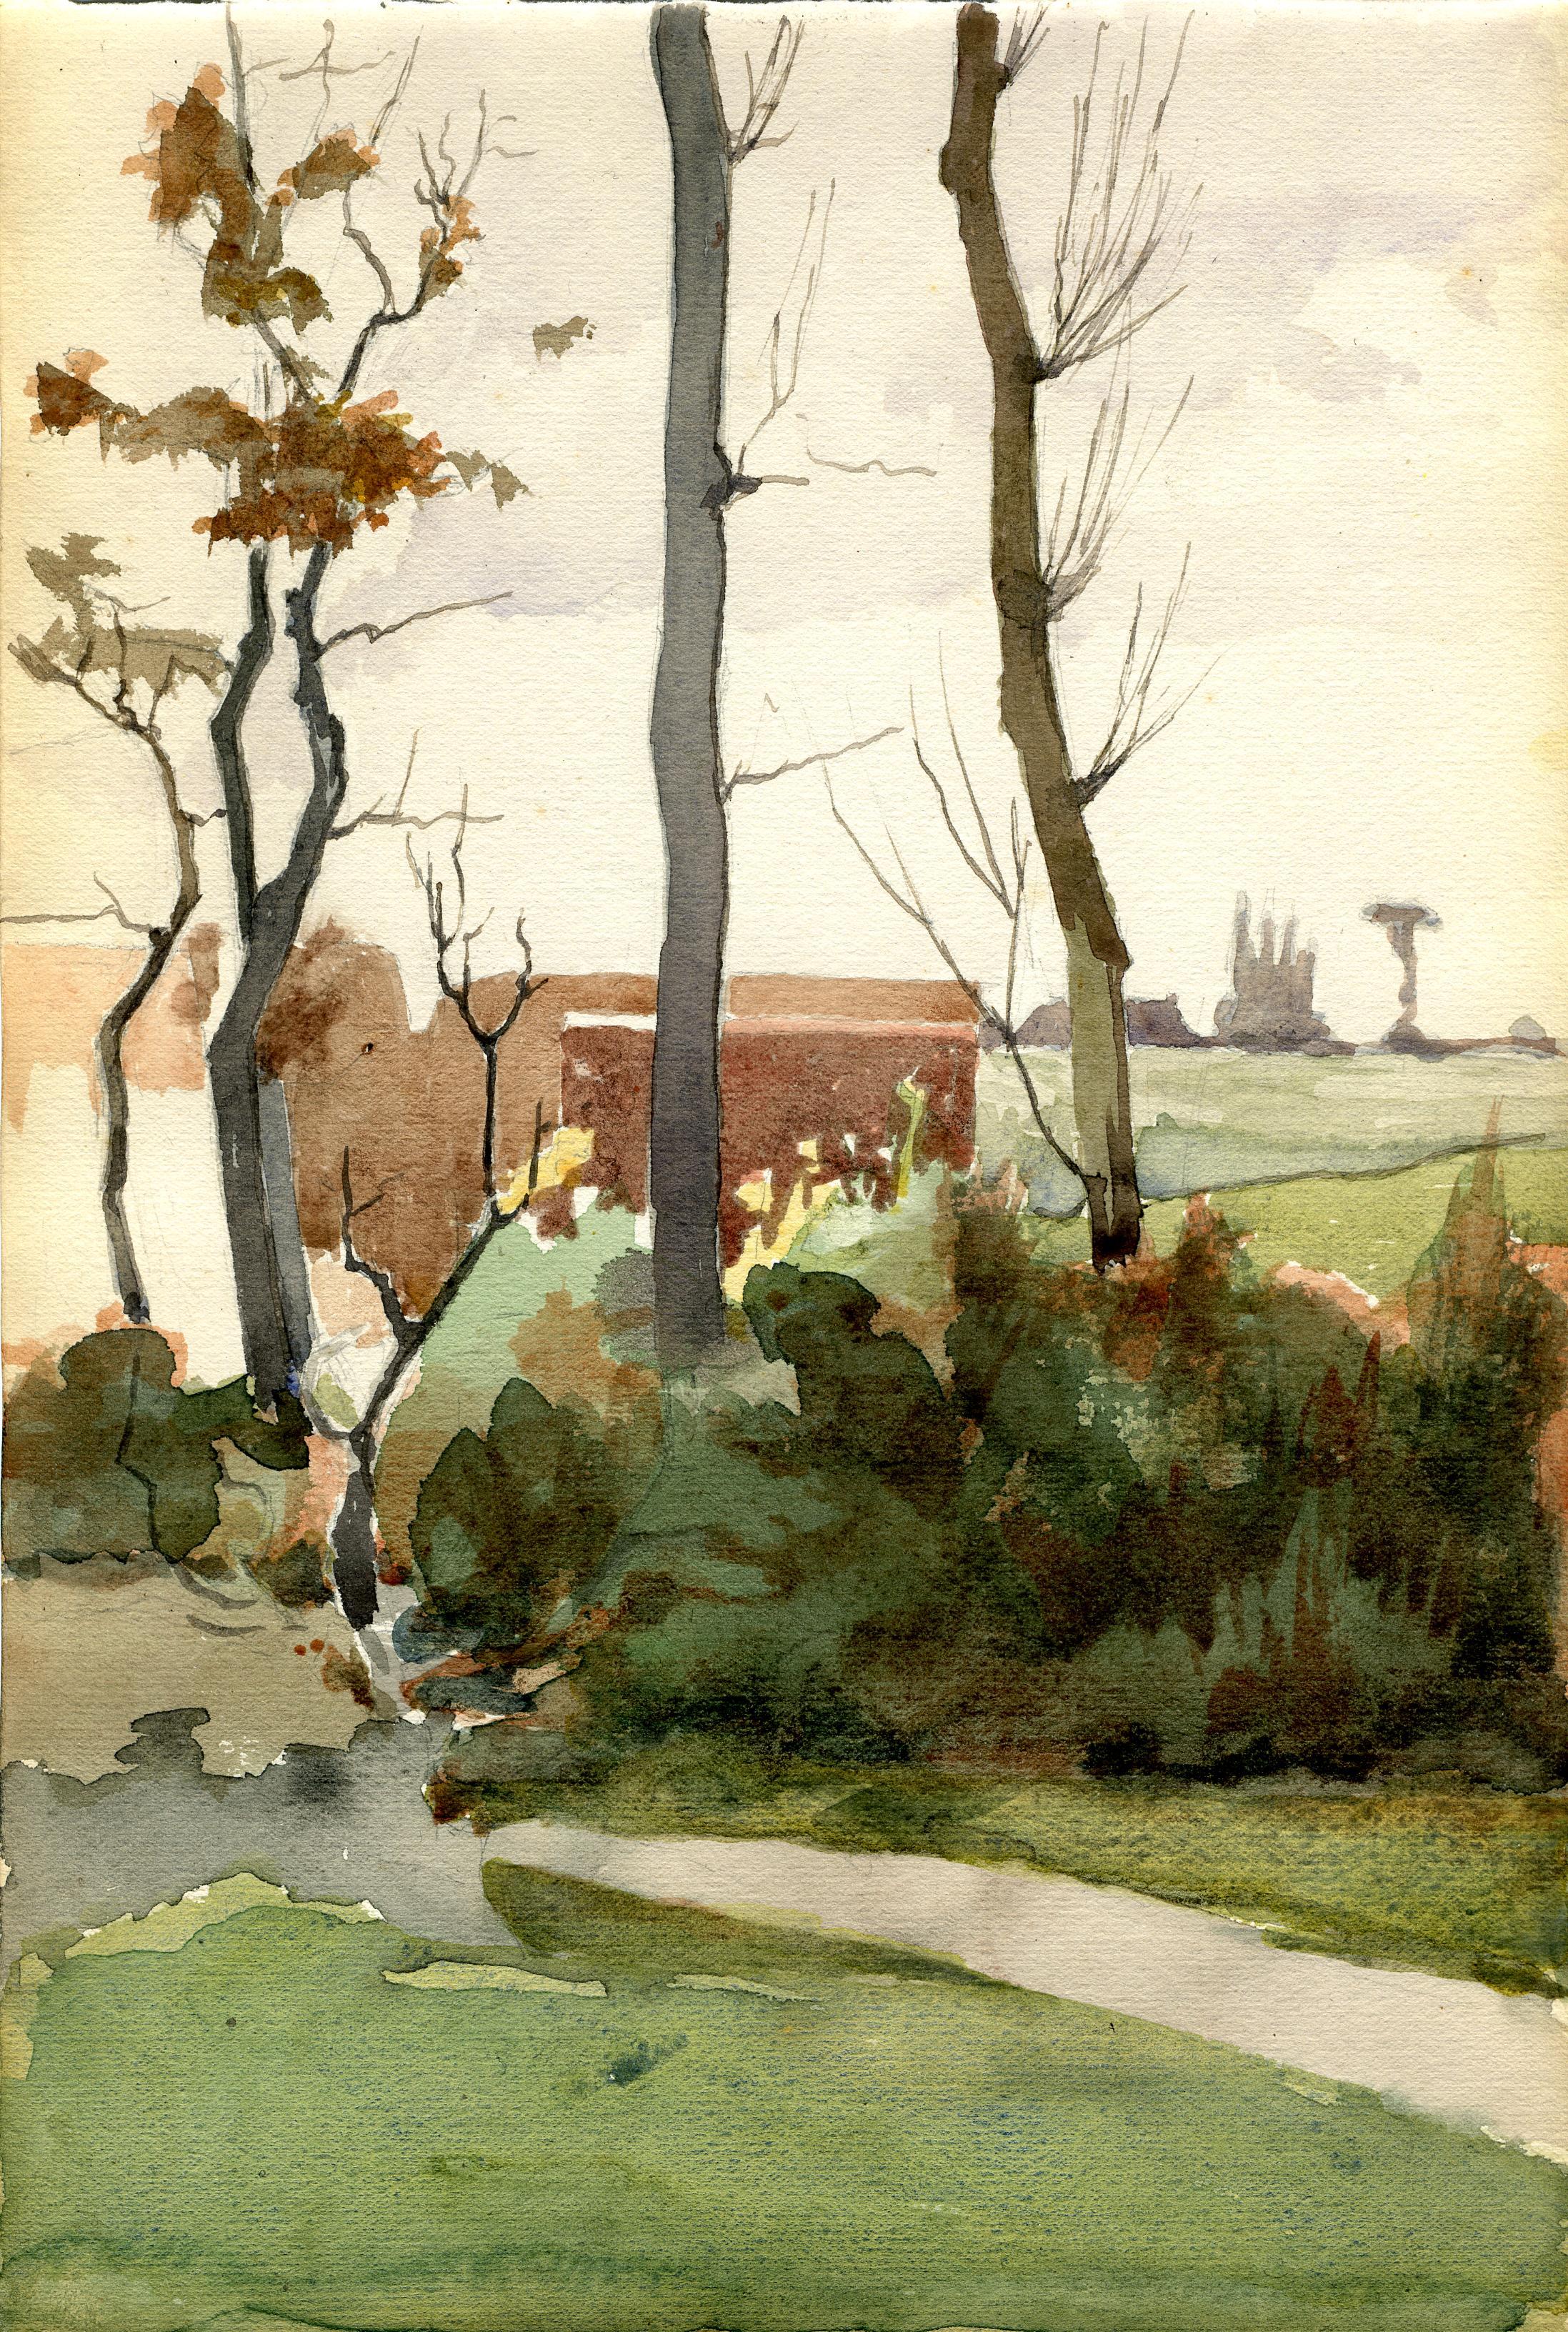 File:1896 chemin villageois, aquarelle par Gabriel van Dievoet (1875-1934).JPG - Wikimedia Commons